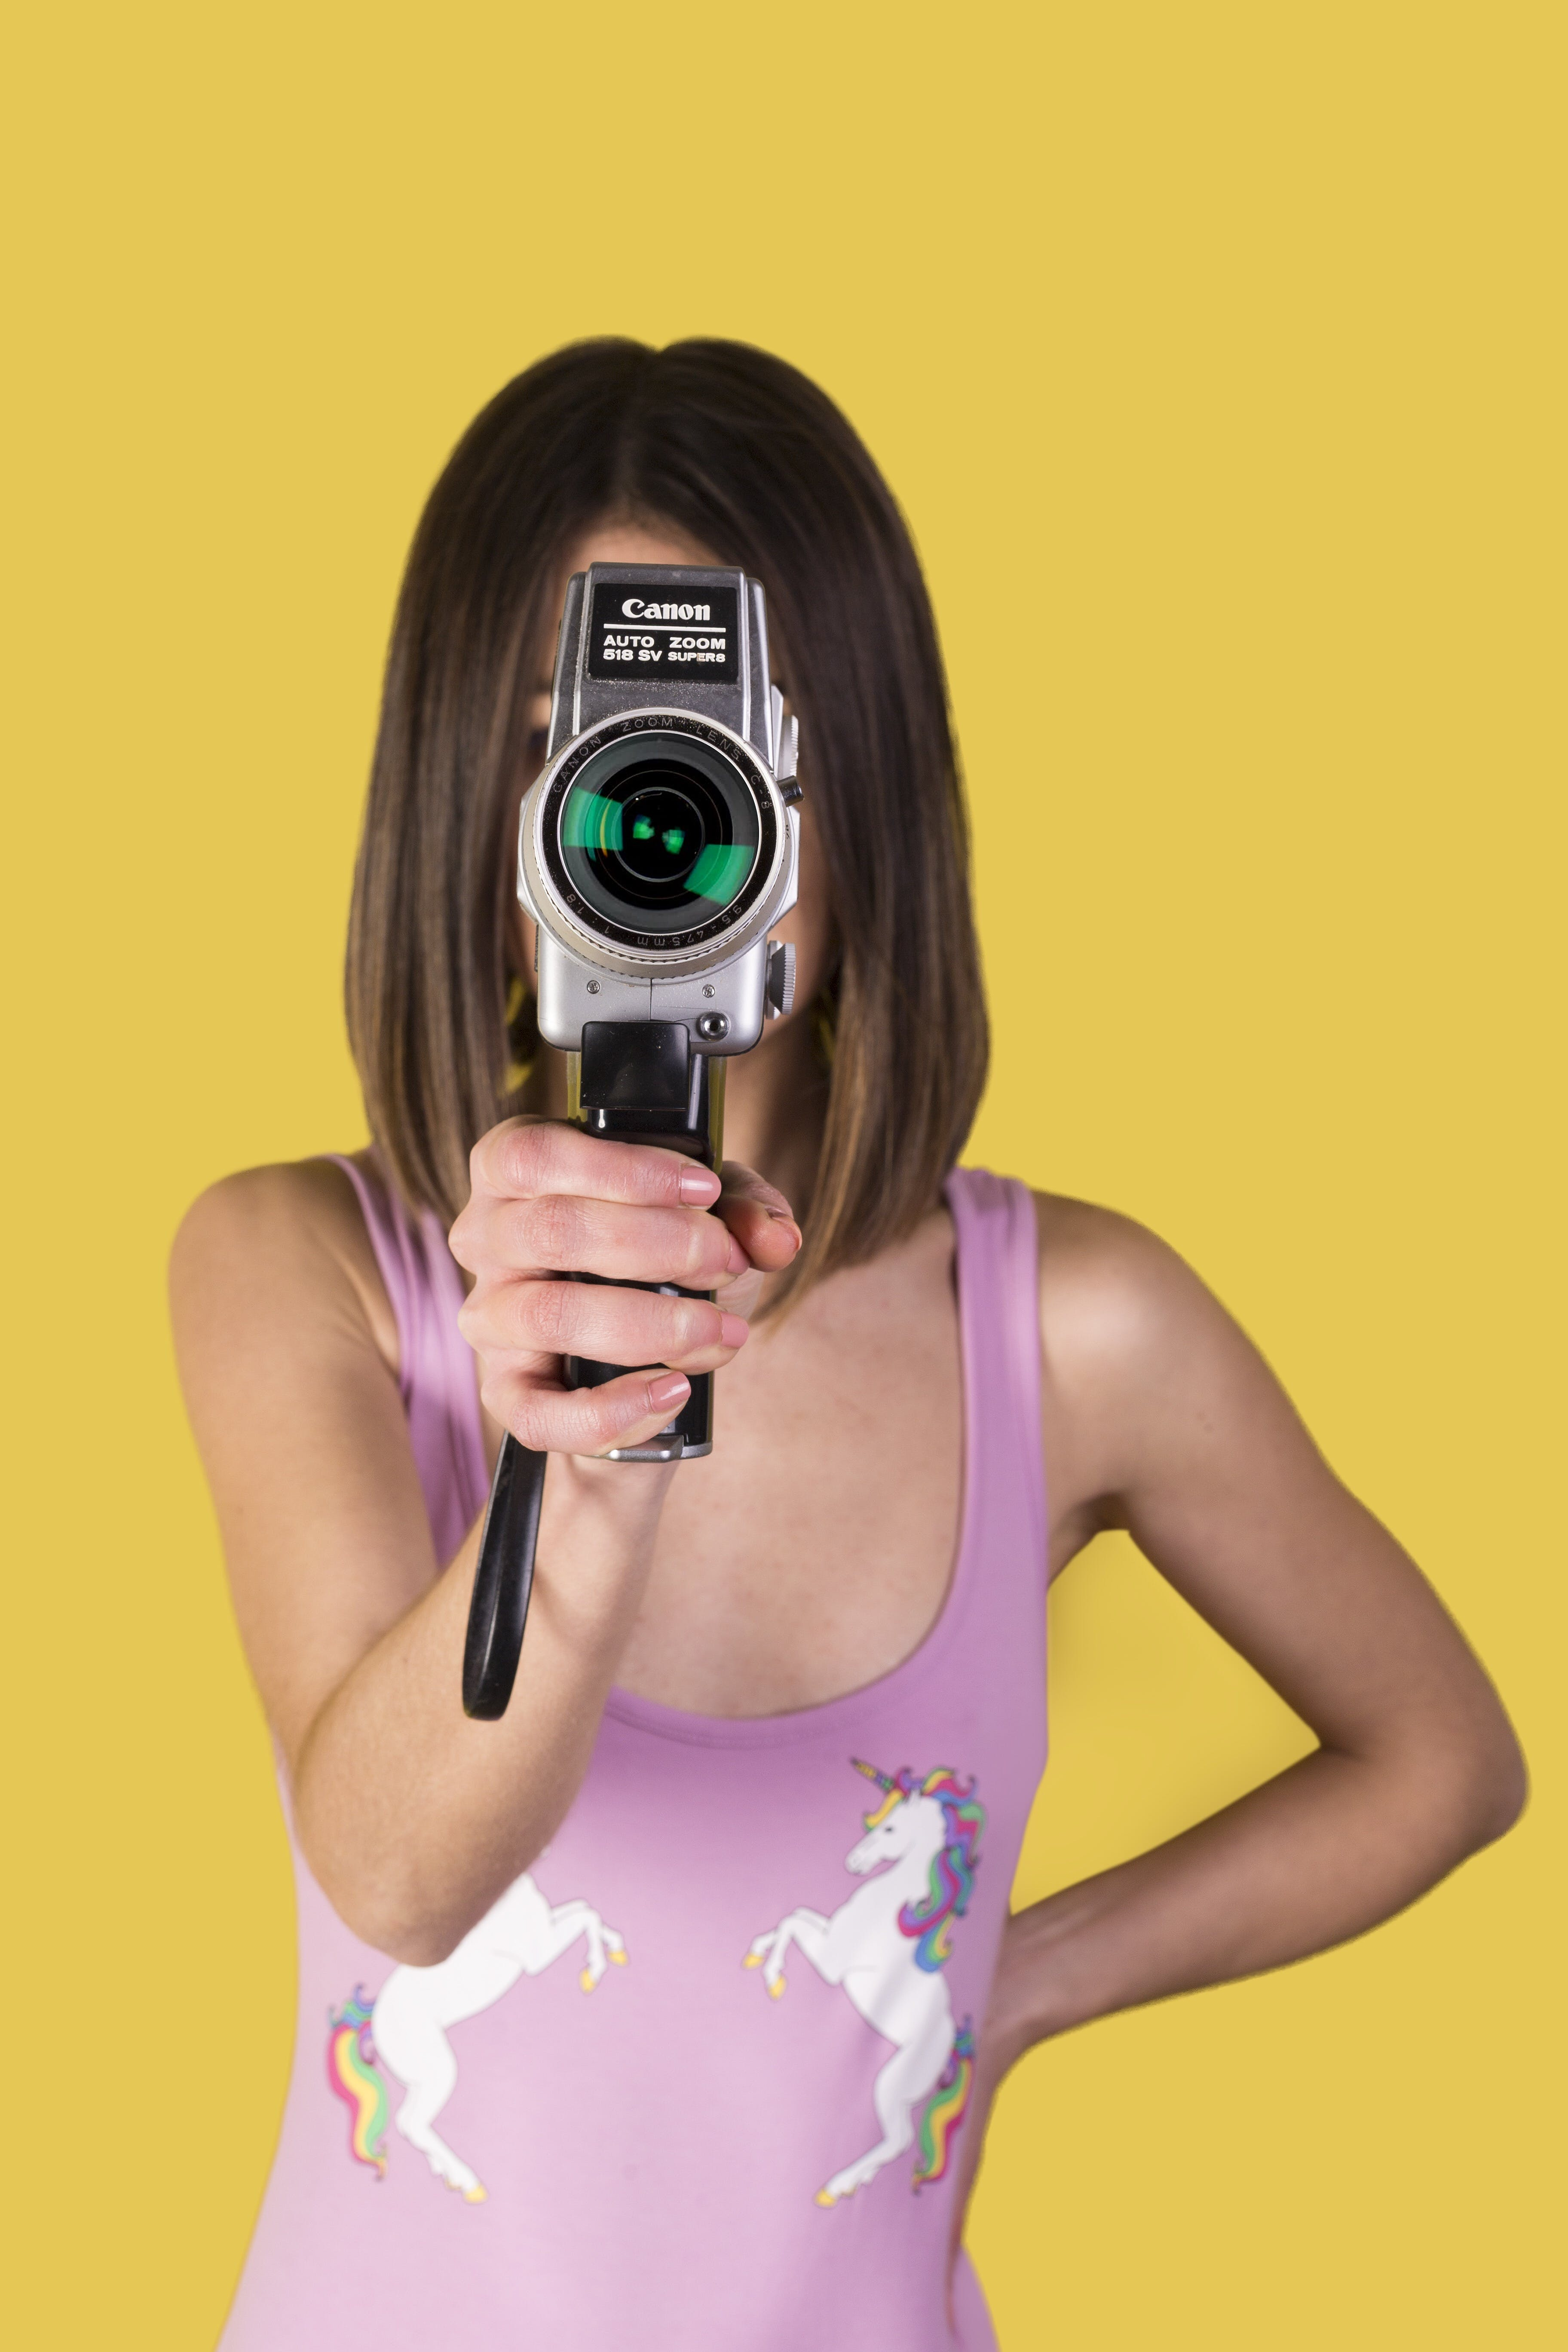 Girl Wearing Purple Tank Top Holding Canon Camera